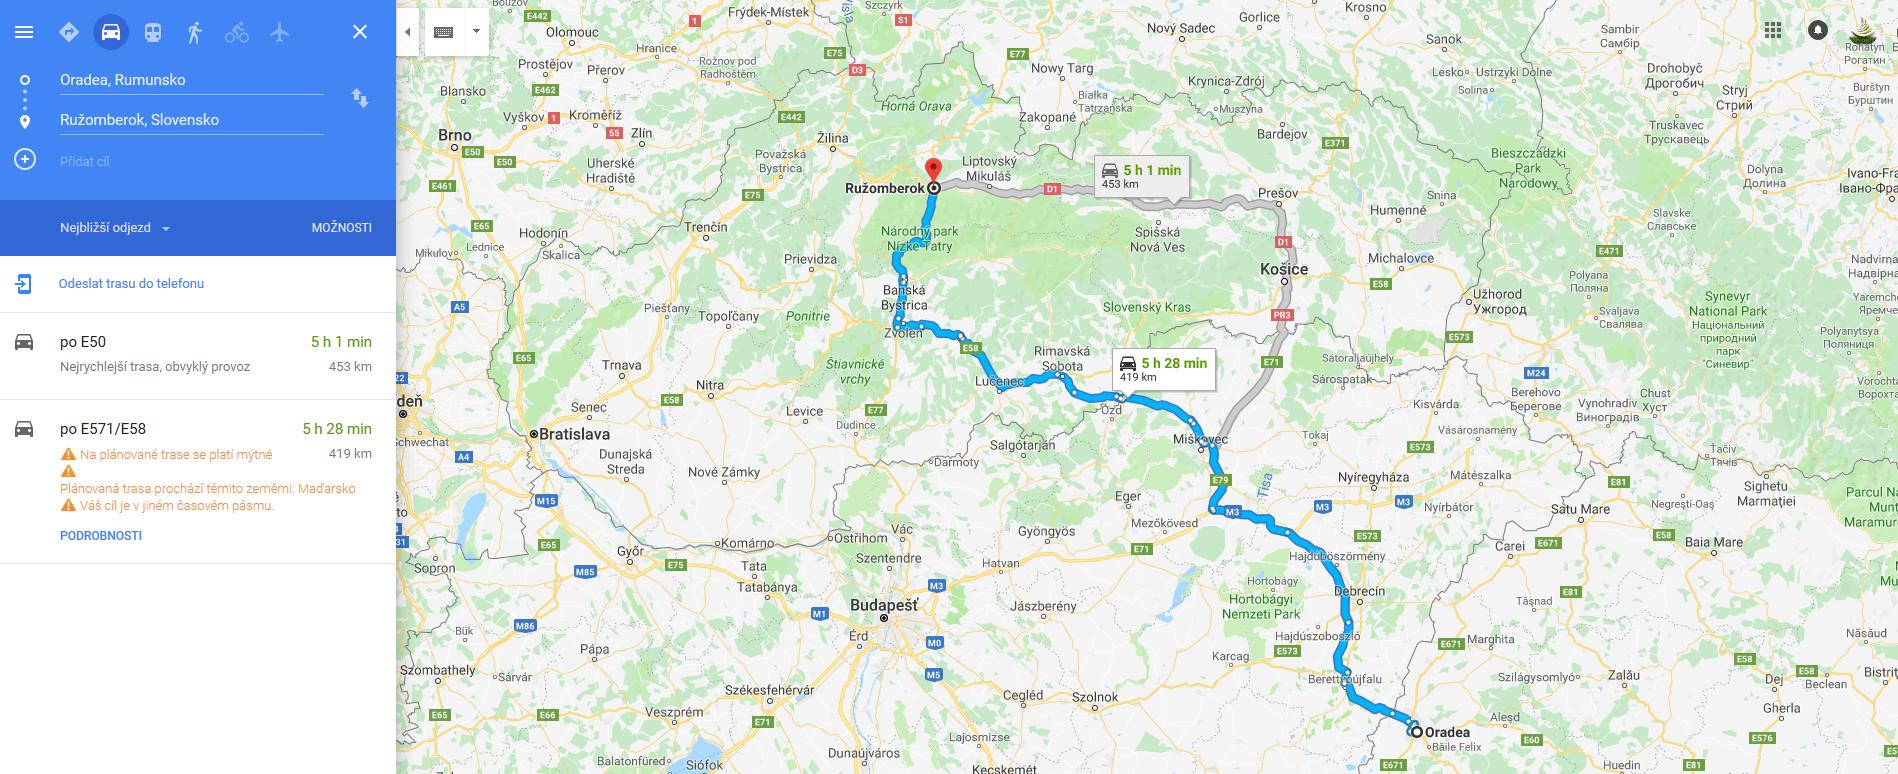 https://www.kempy-chaty.cz/sites/default/files/turistika/mapa_oradea_ruzomberok.png